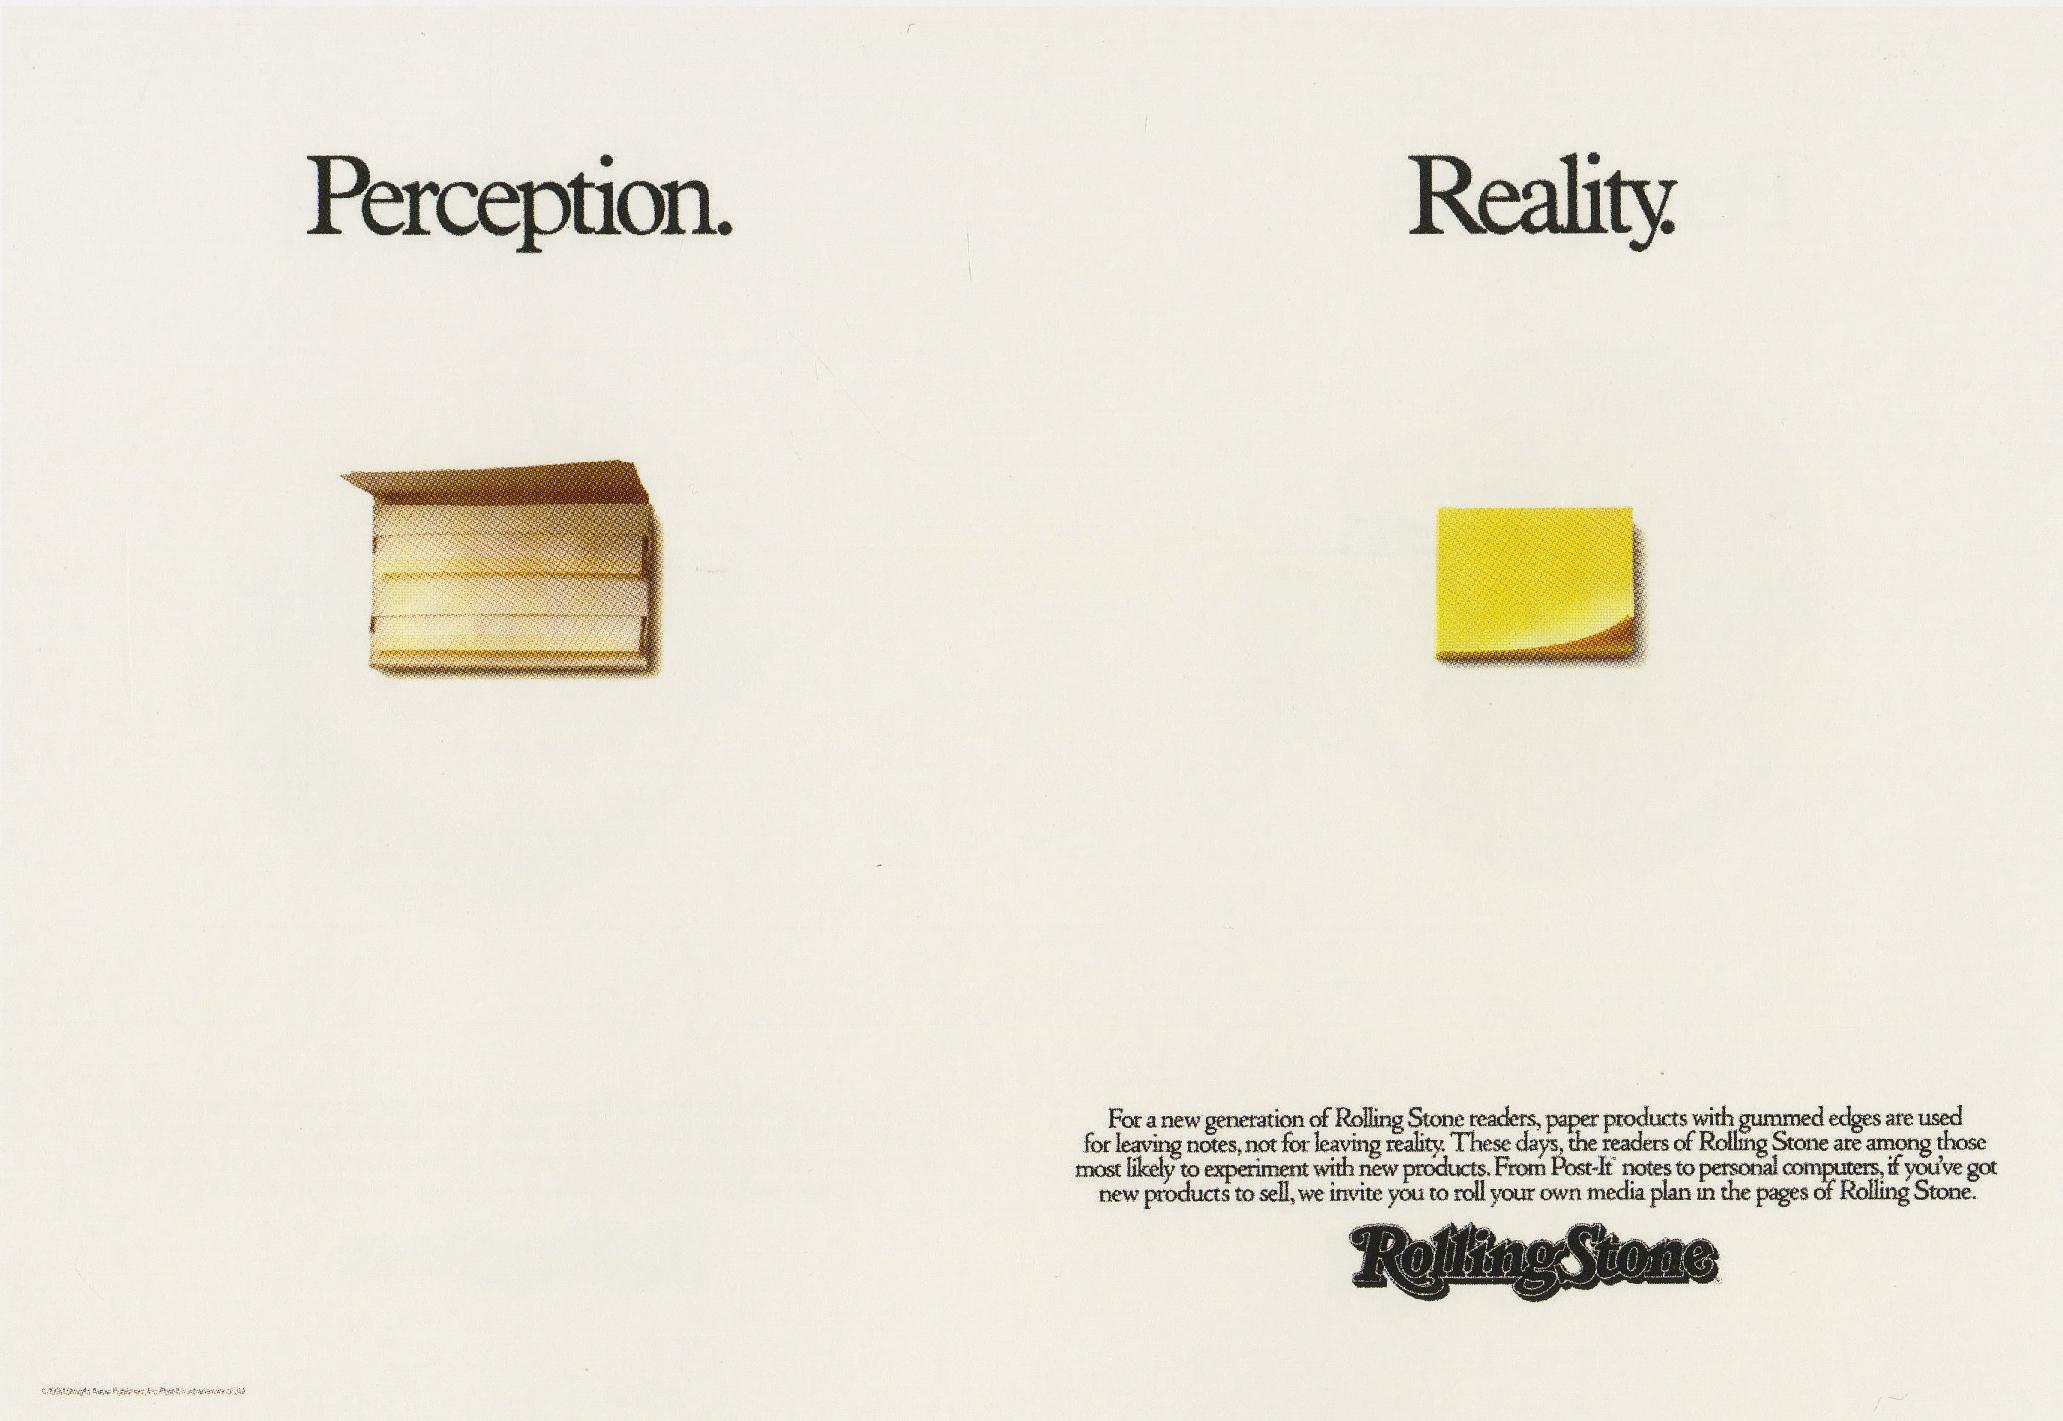 Fallon McElligott, Rolling Stone 'Post It'-01